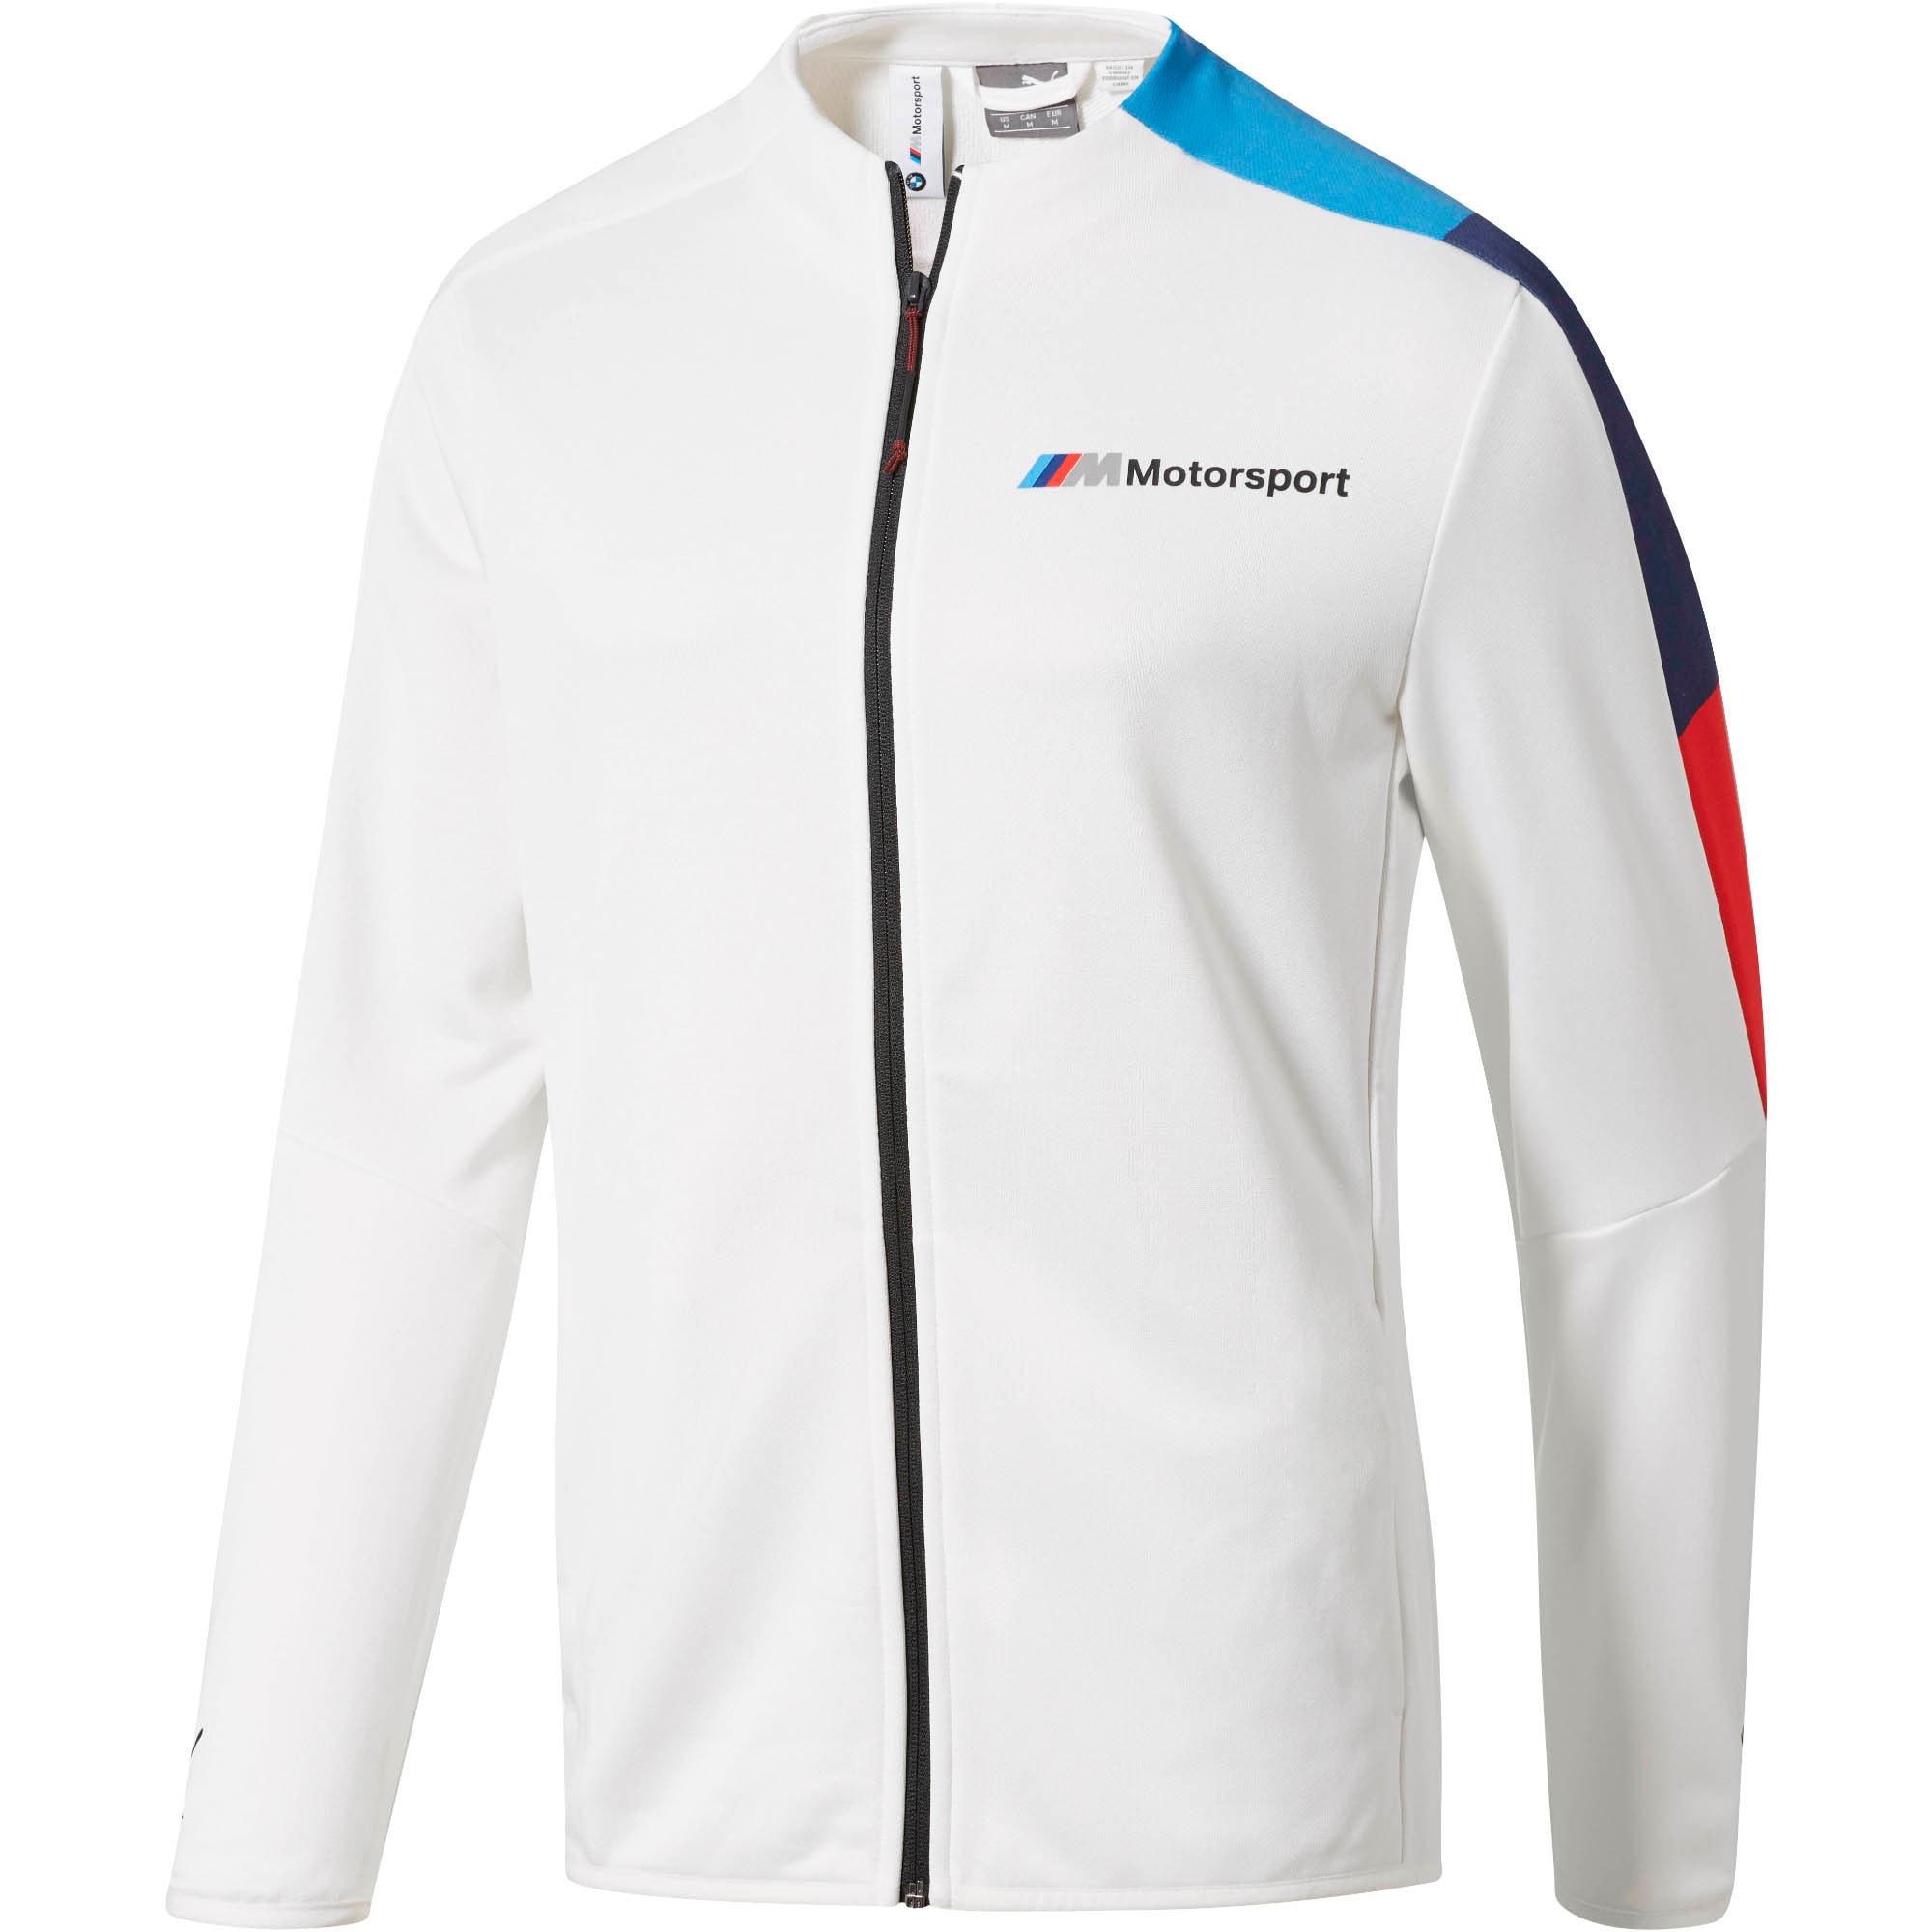 Thumbnail 1 of BMW M Motorsport Men's T7 Track Jacket, Puma White, medium